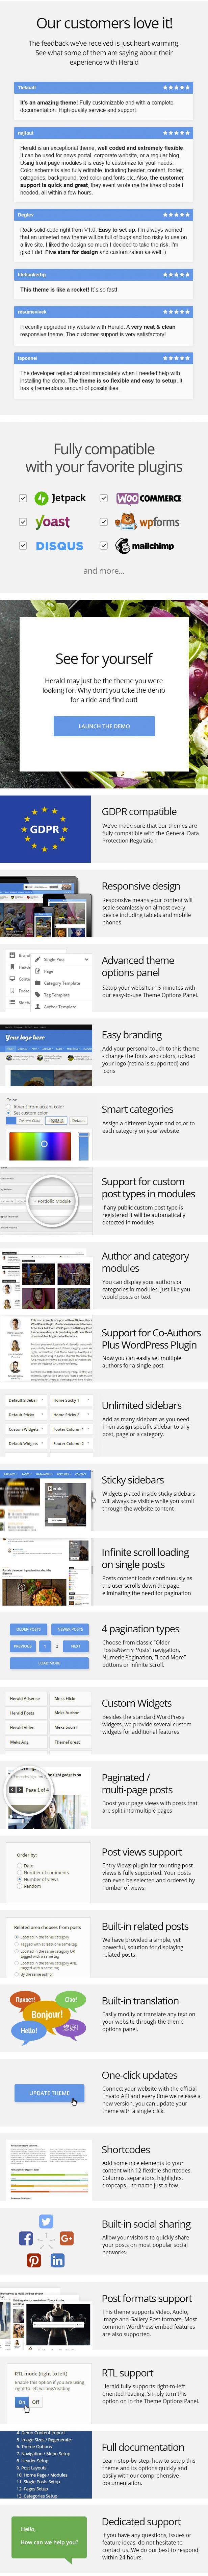 herald features part02 v4 - Herald - Newspaper & News Portal WordPress Theme